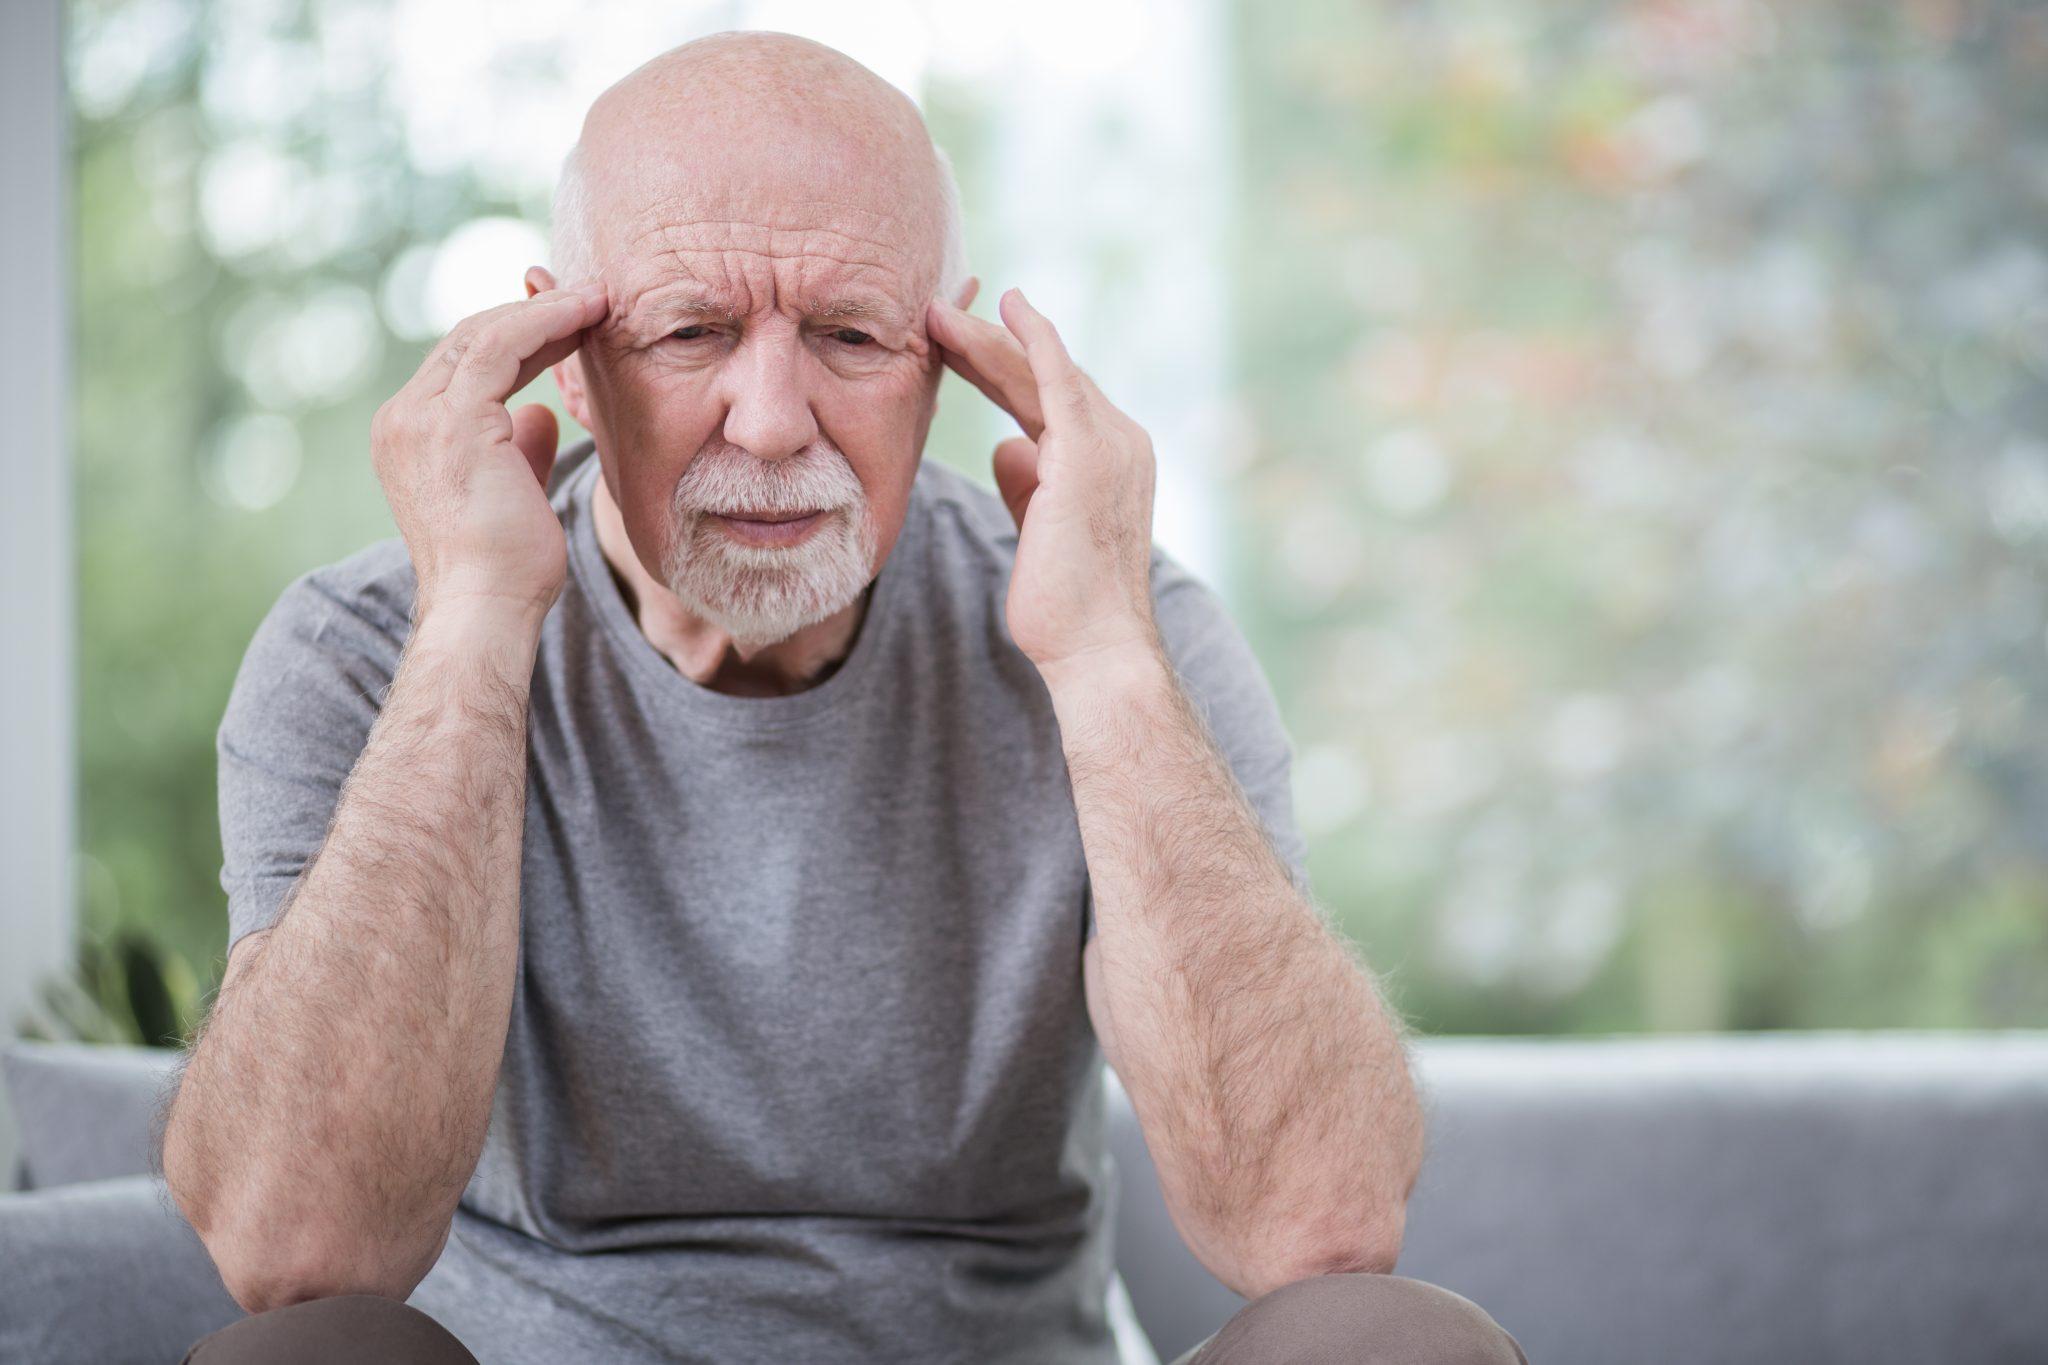 meddi- blog de evento vascular cerebral foto destacada- migraña